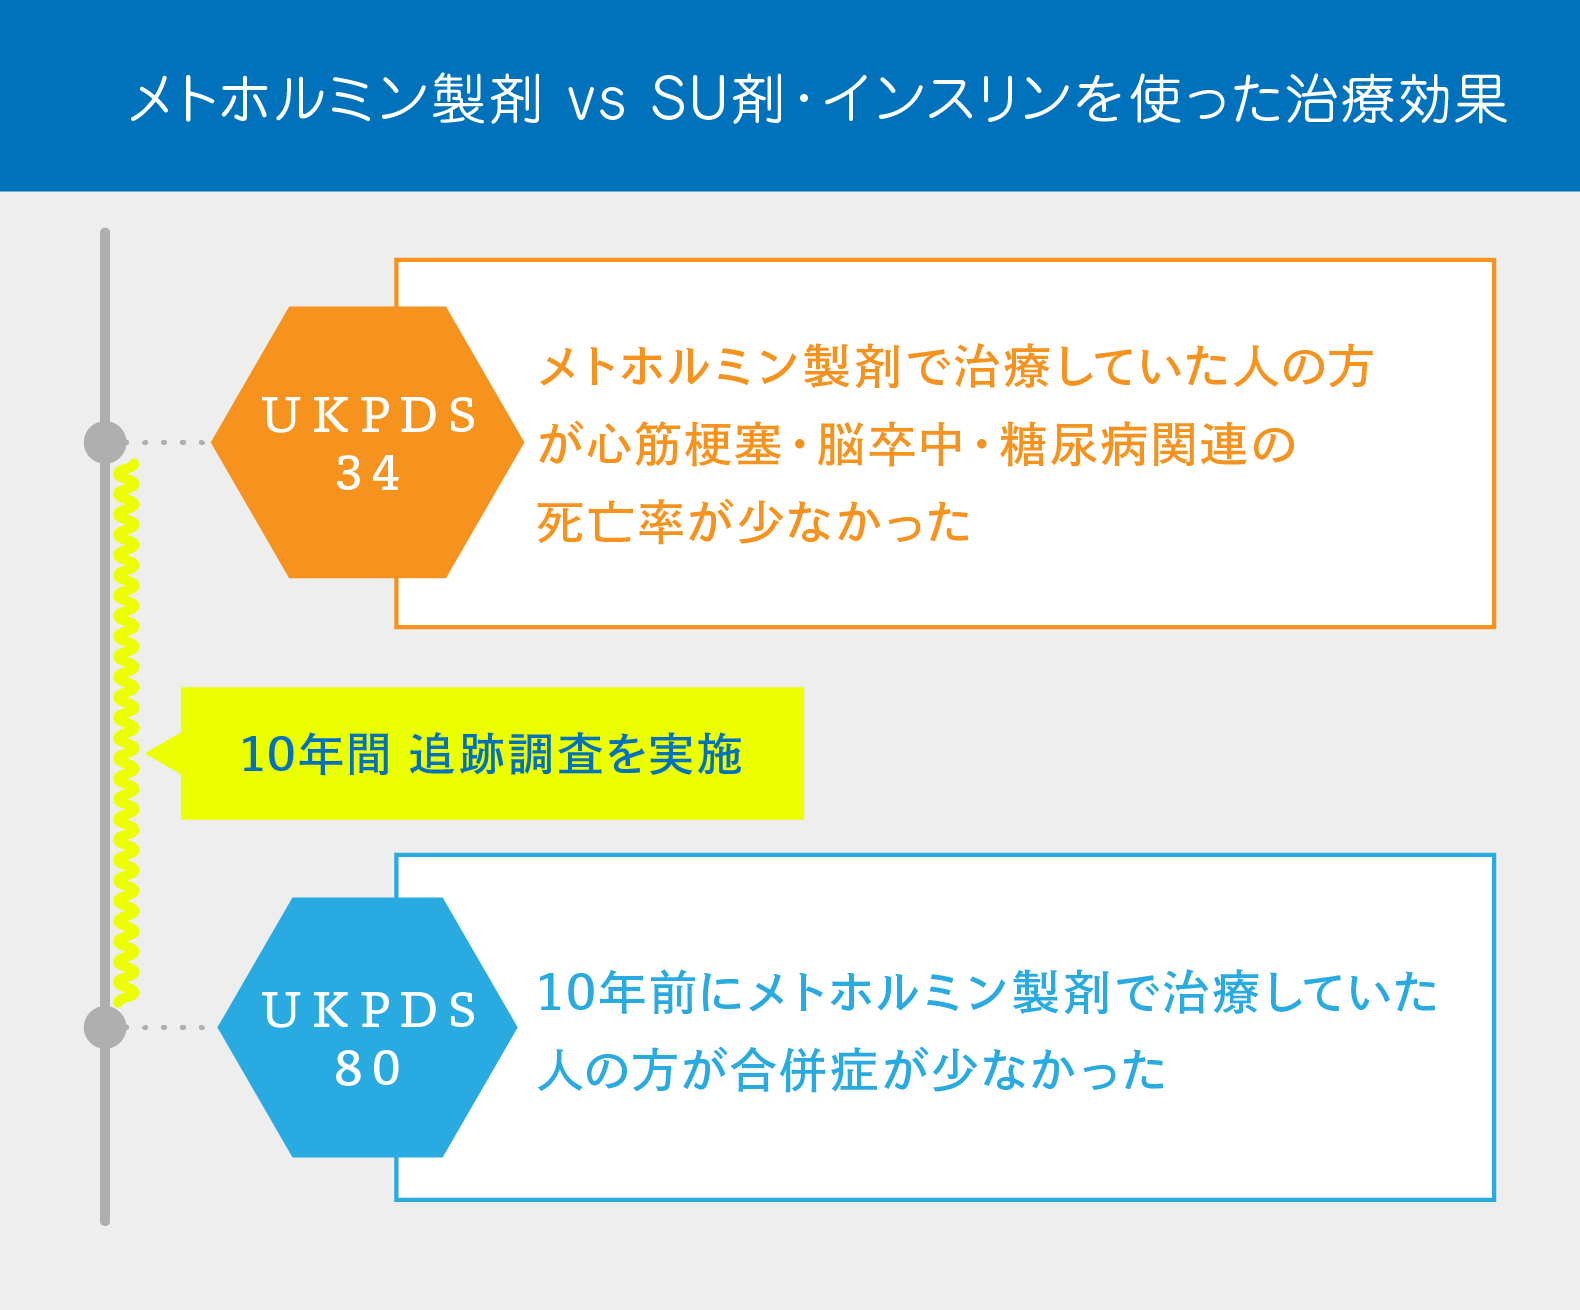 UKPDS34試験とUKPDS80試験におけるメトホルミンの治療効果